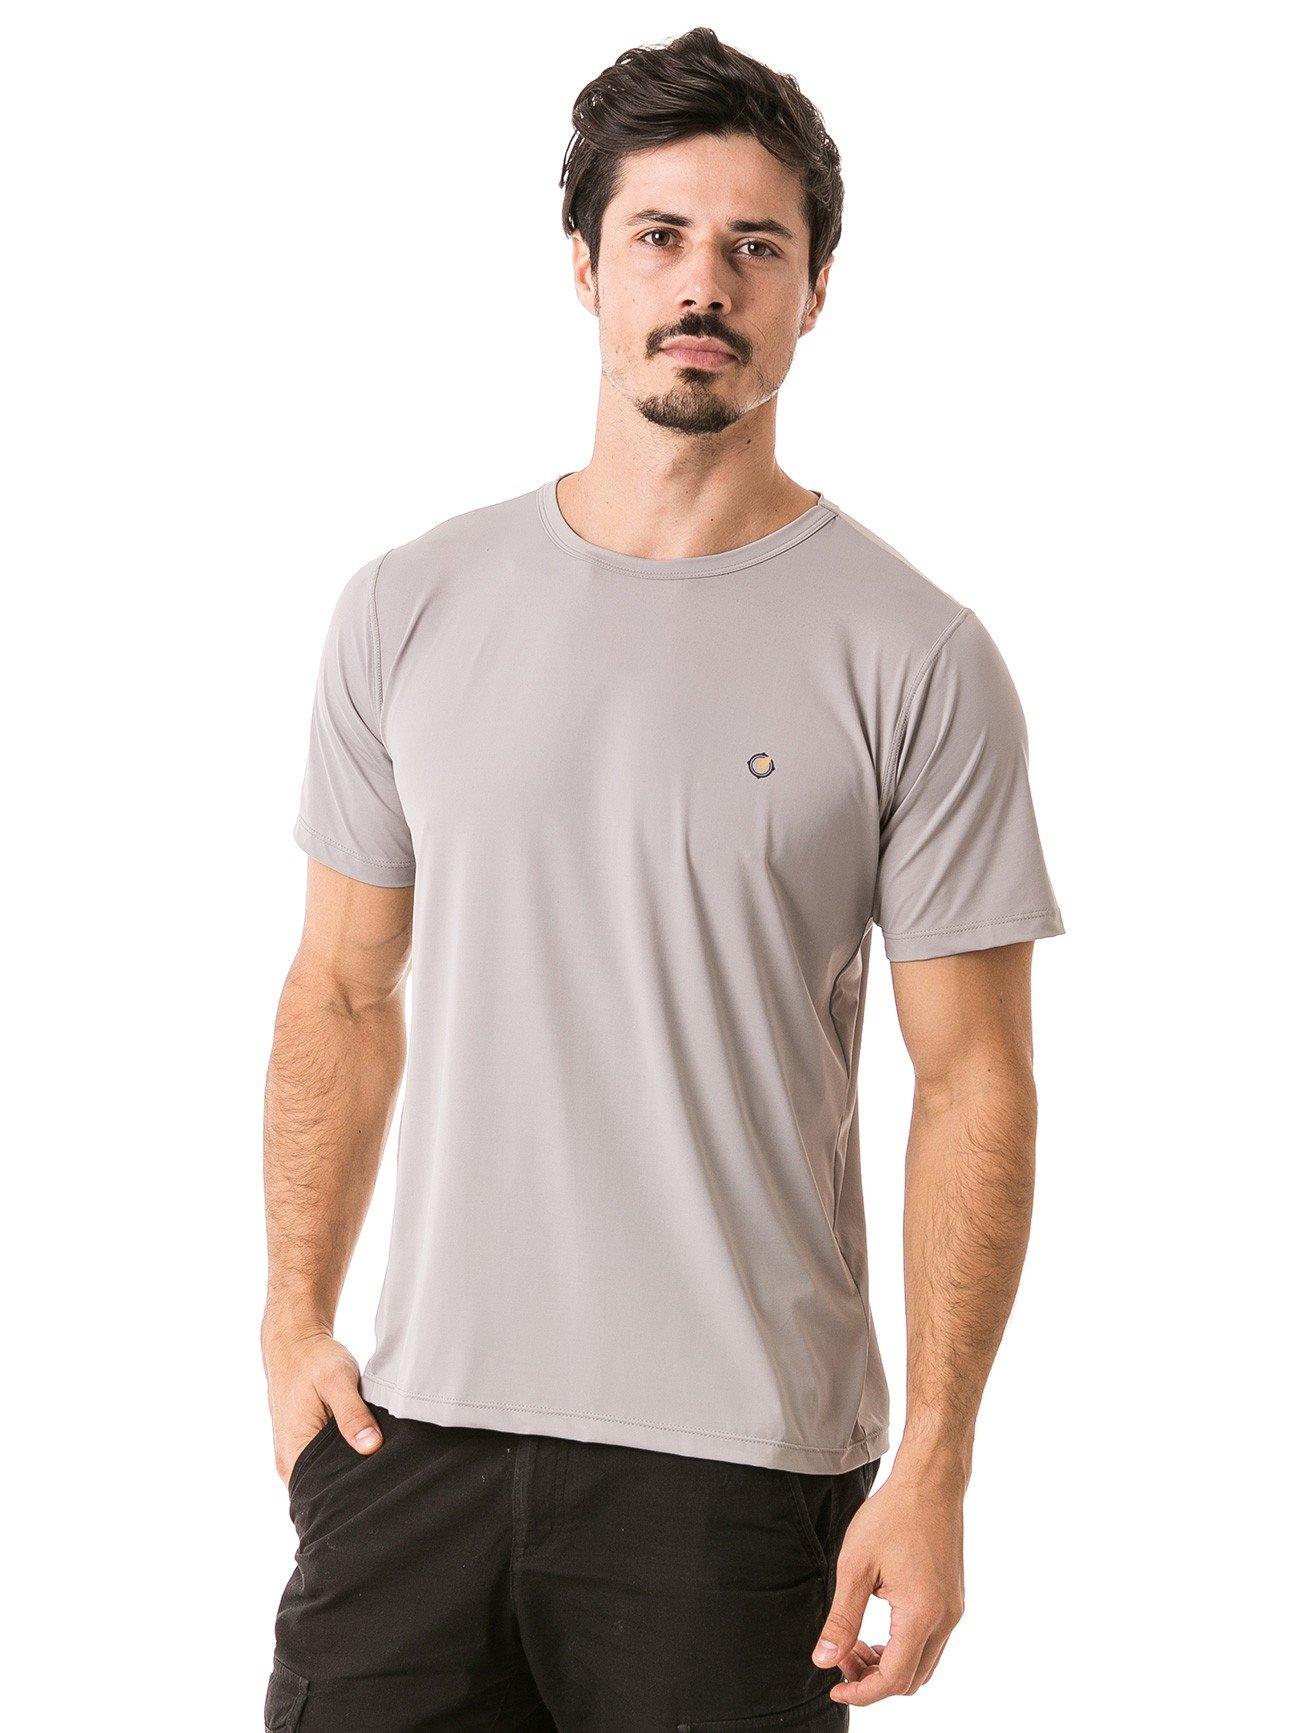 masculina t shirt curta ice frente cinza b